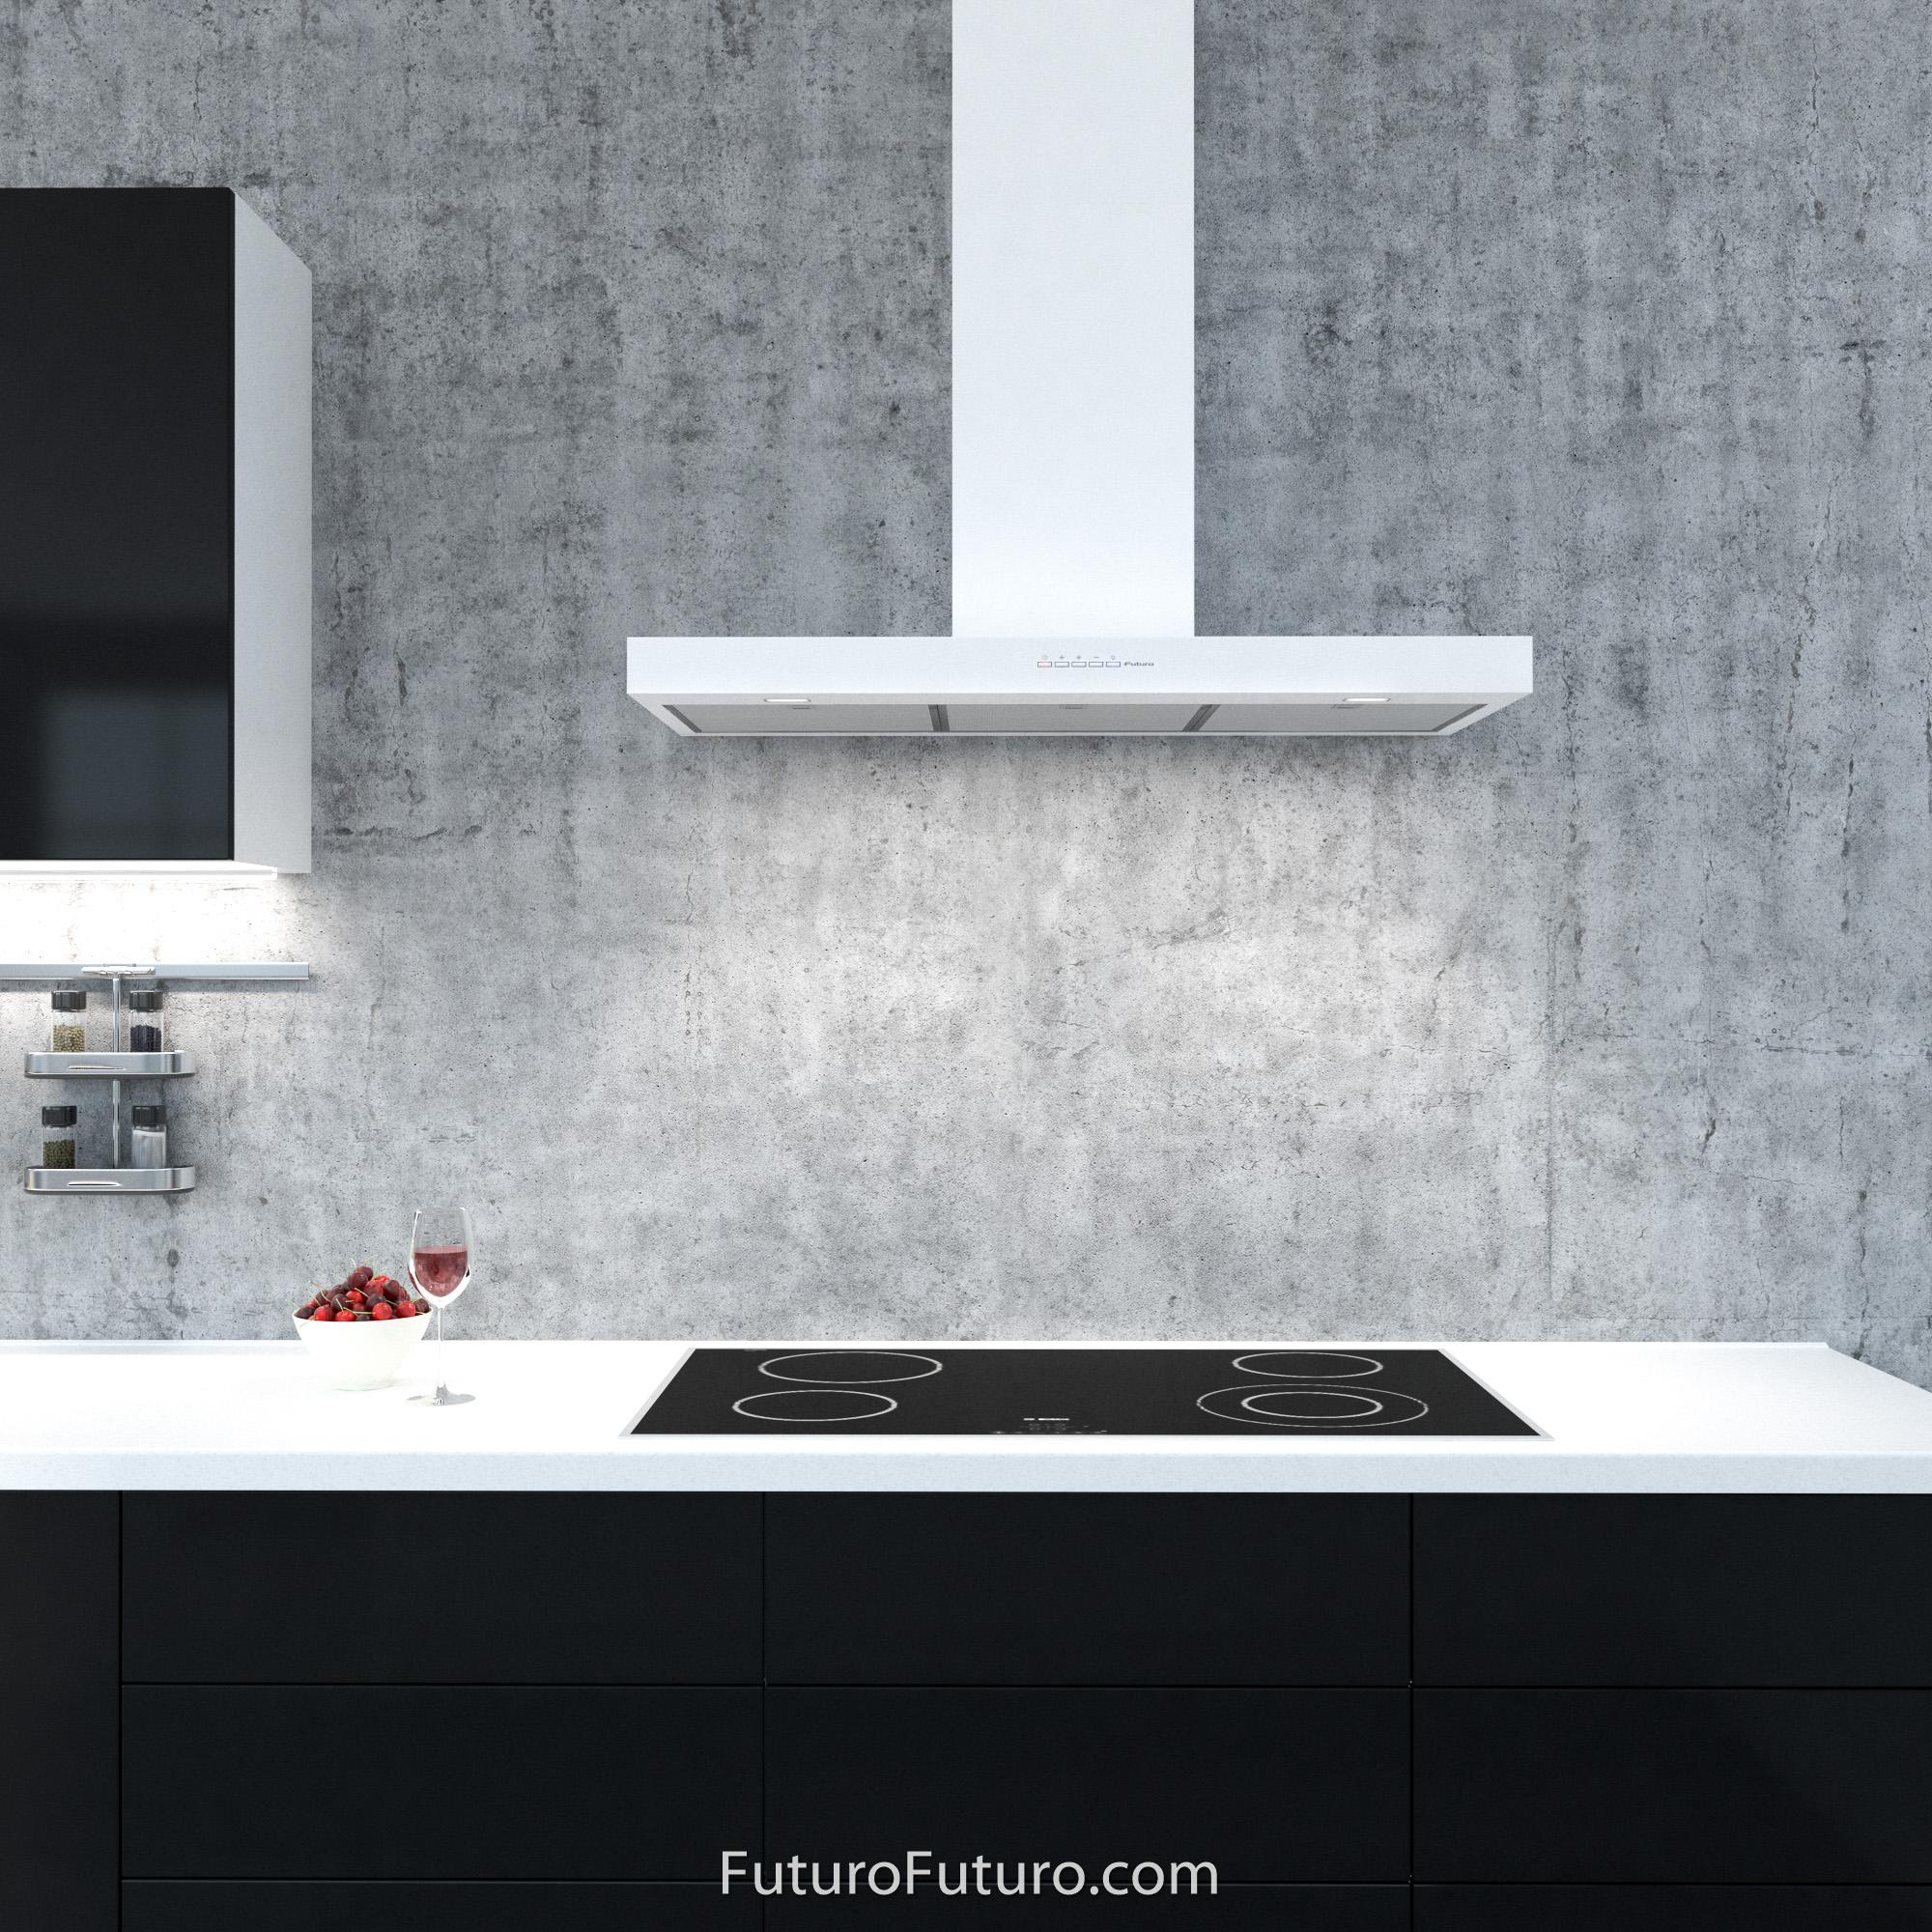 range hood 36 inch minimal white wall mount by futuro futuro